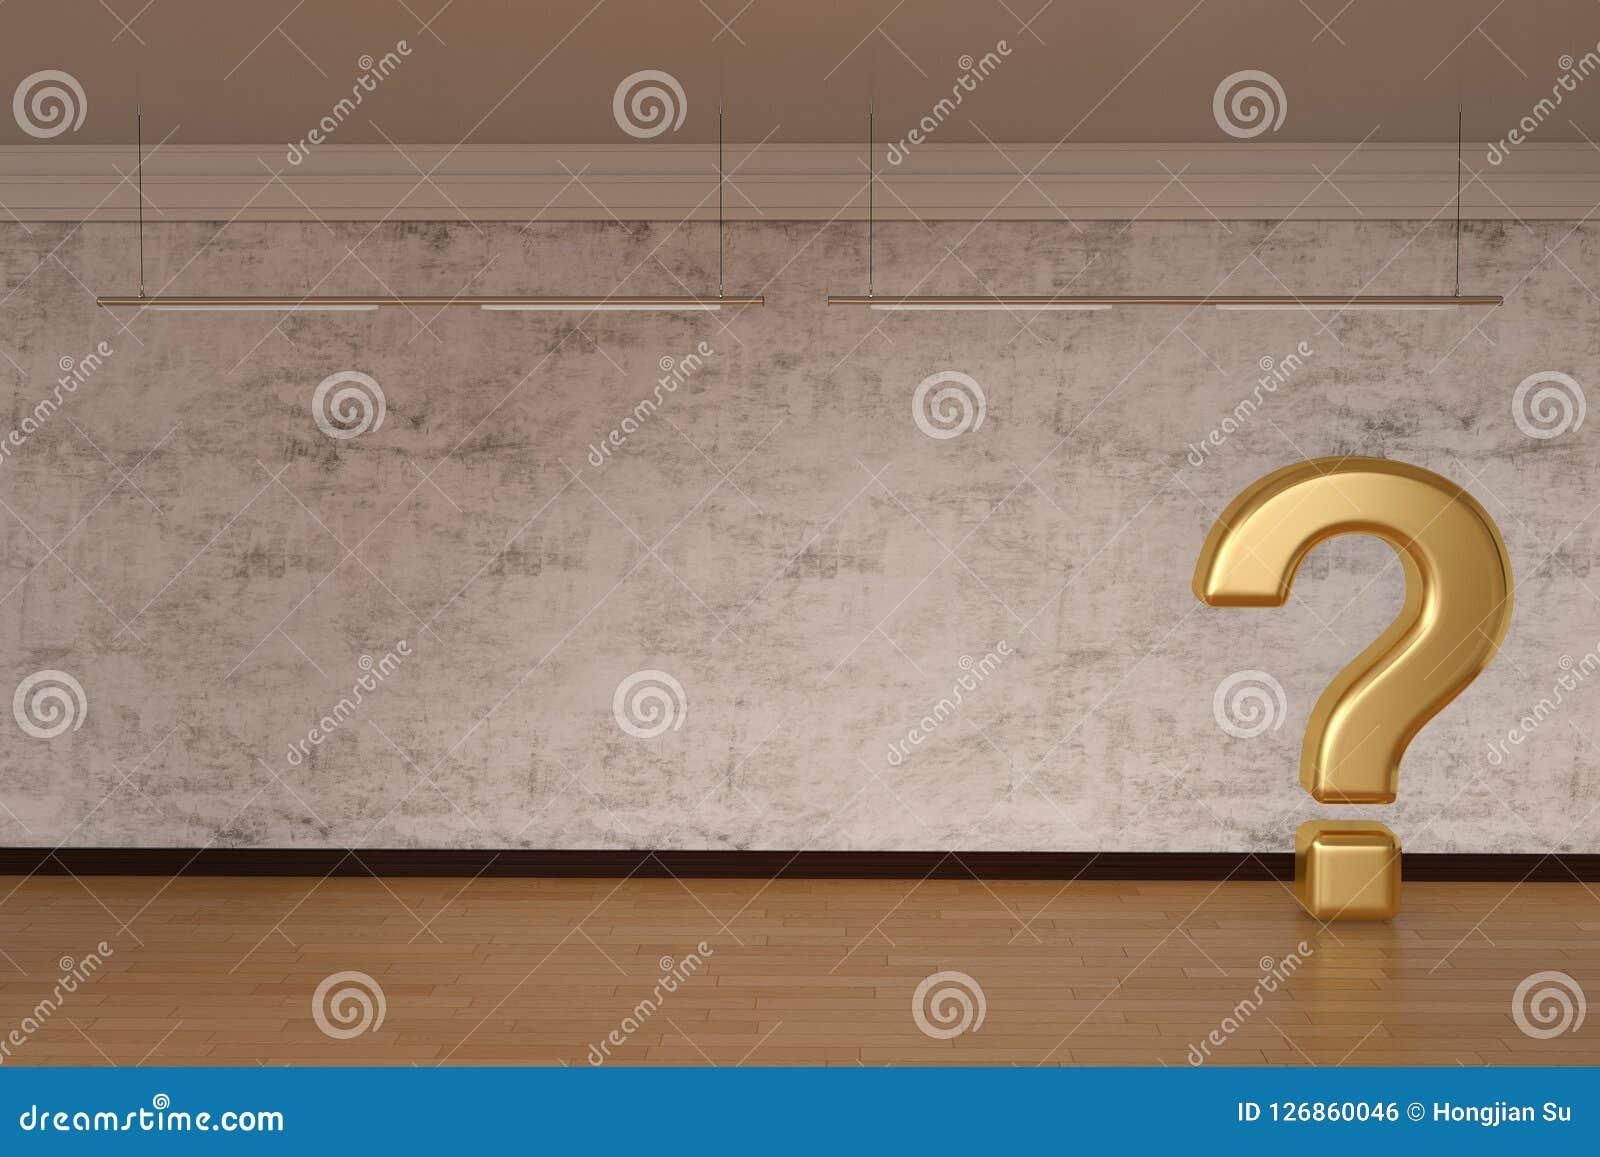 Golden question mark sign on wood floor 3D illustration.